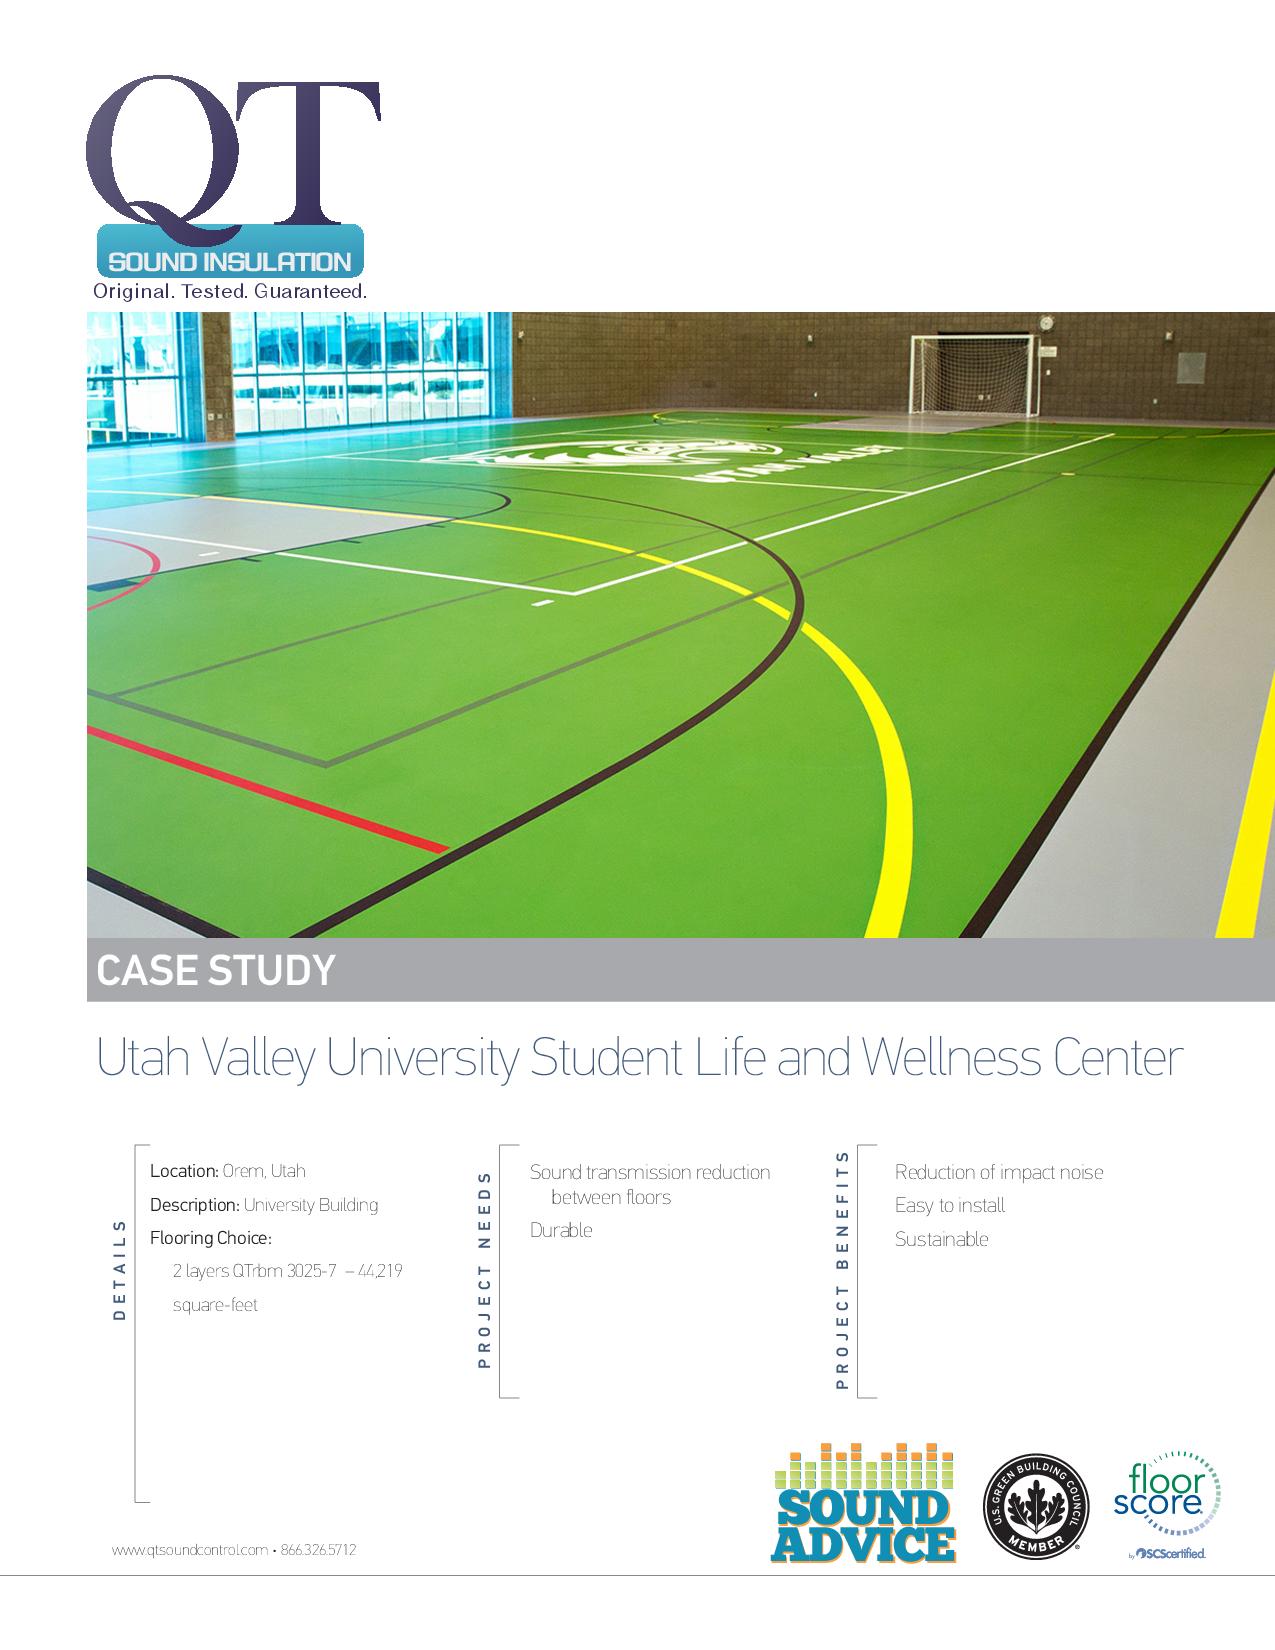 Utah Valley University Student Life and Wellness Center